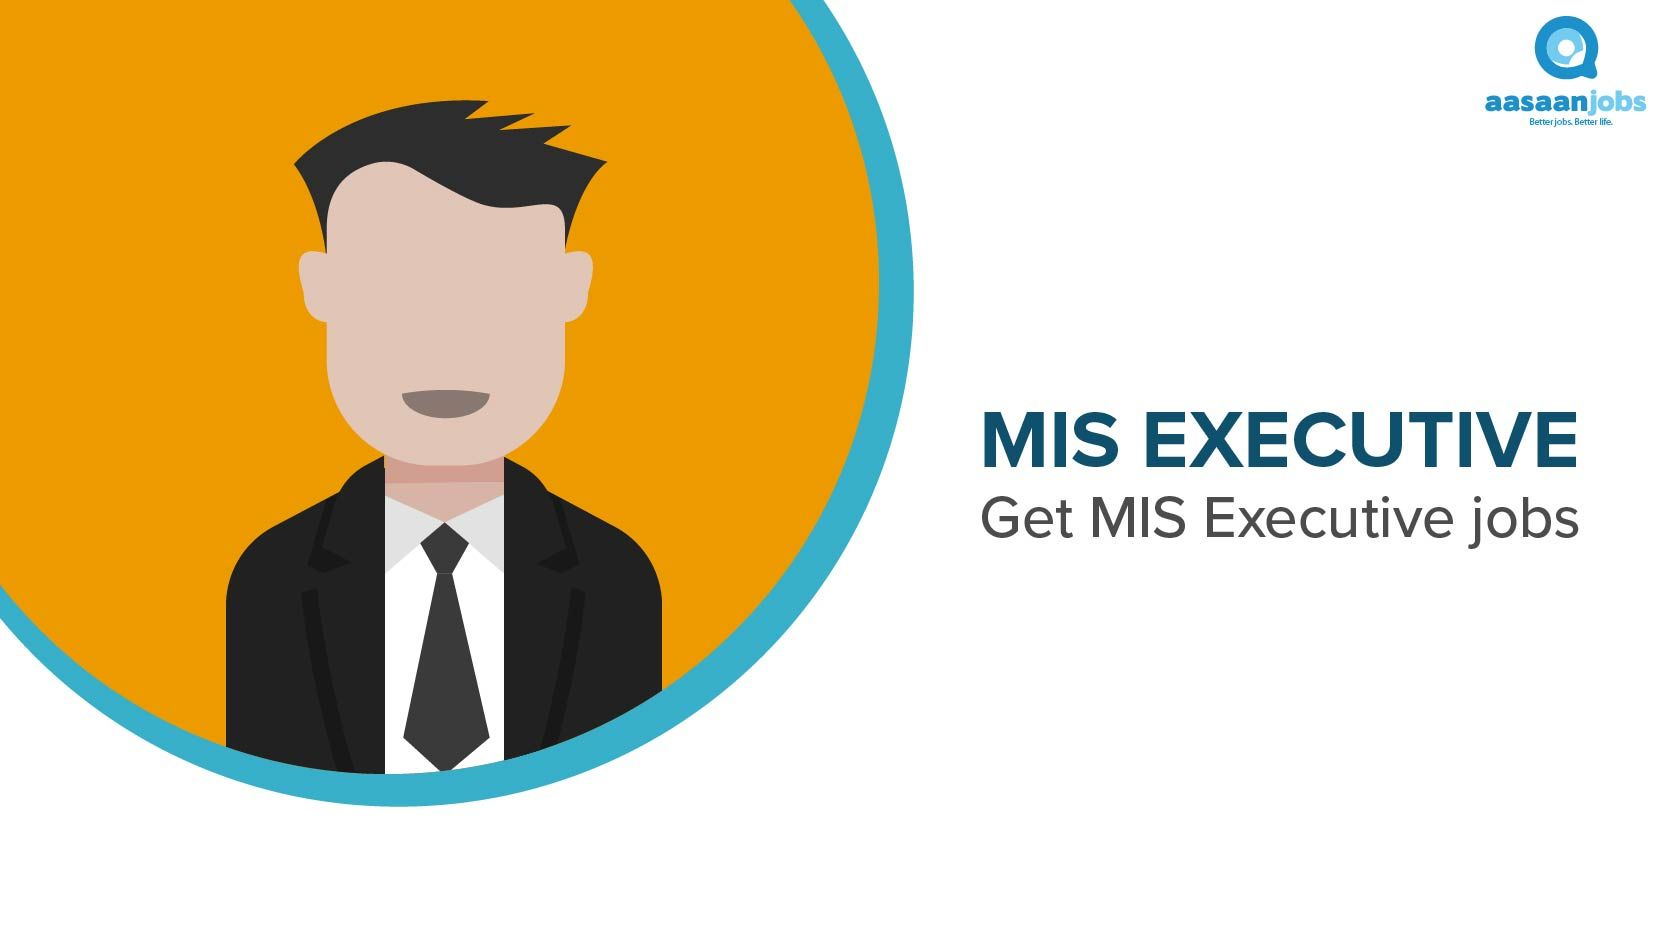 MIS executive